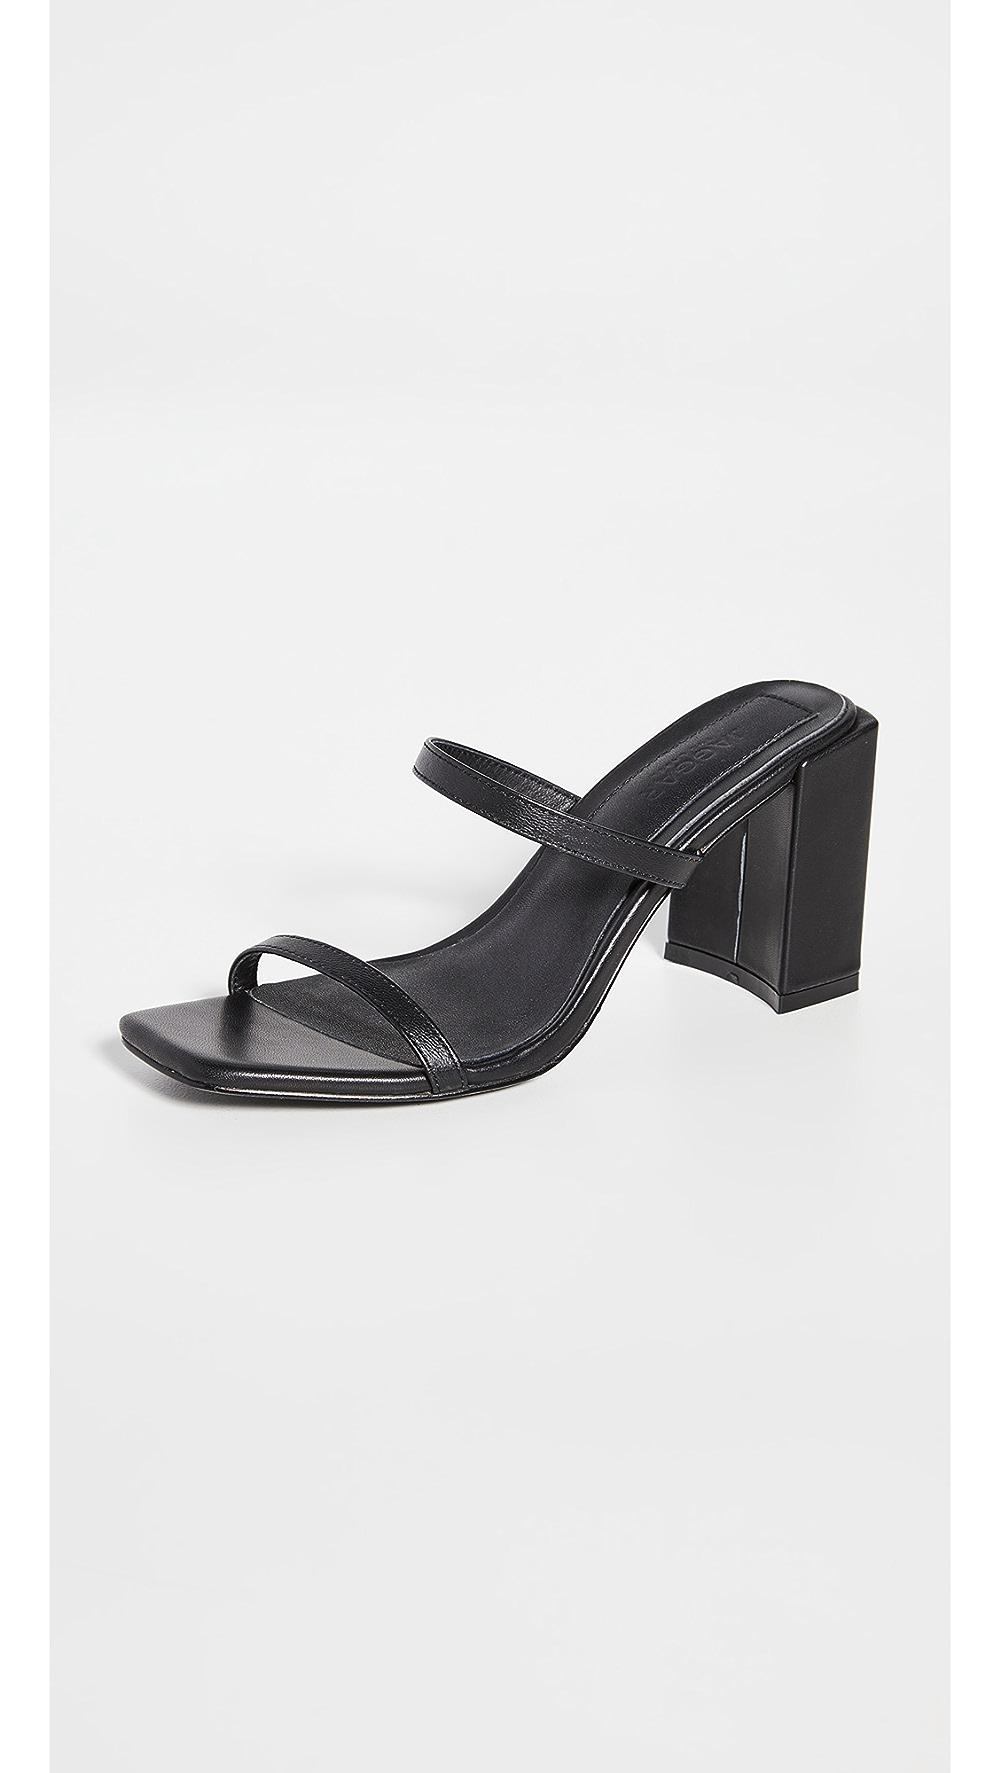 Brilliant Jaggar - Square Heel Sandals Modern Design